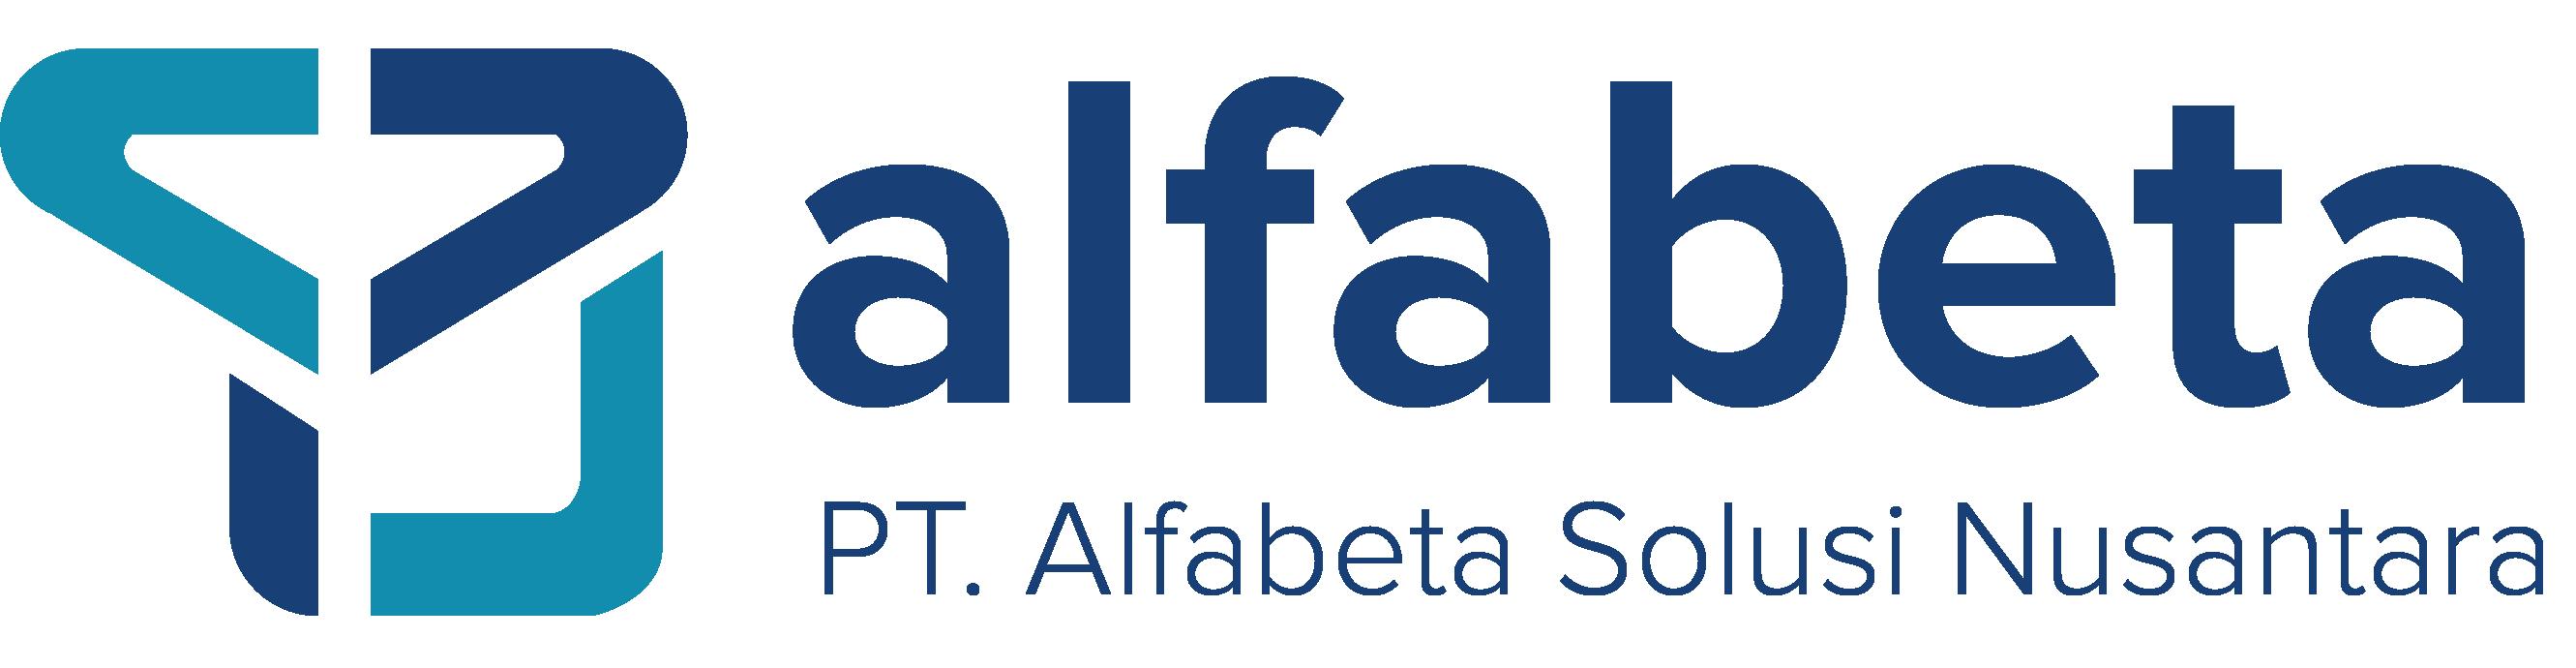 Alfabeta Solusi Nusantara company logo